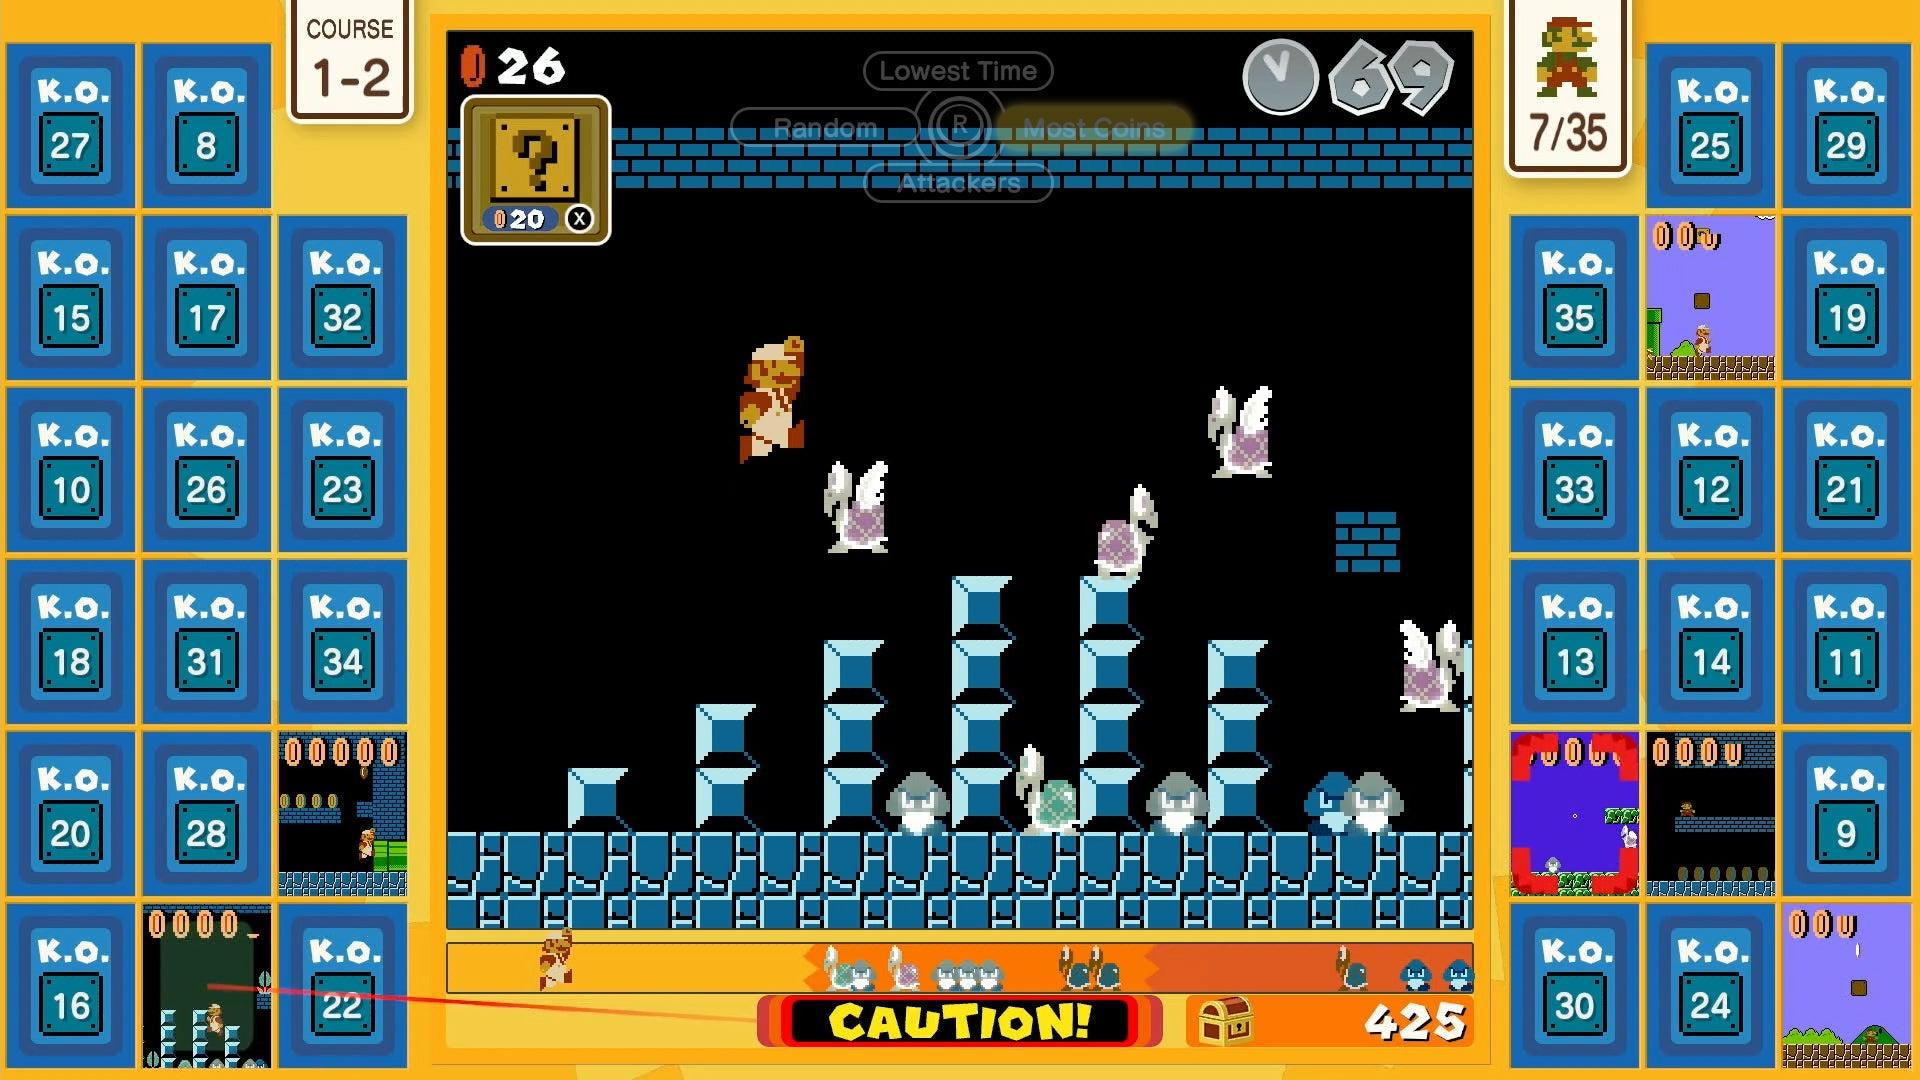 Image for You can play as Luigi in Super Mario Bros. 35